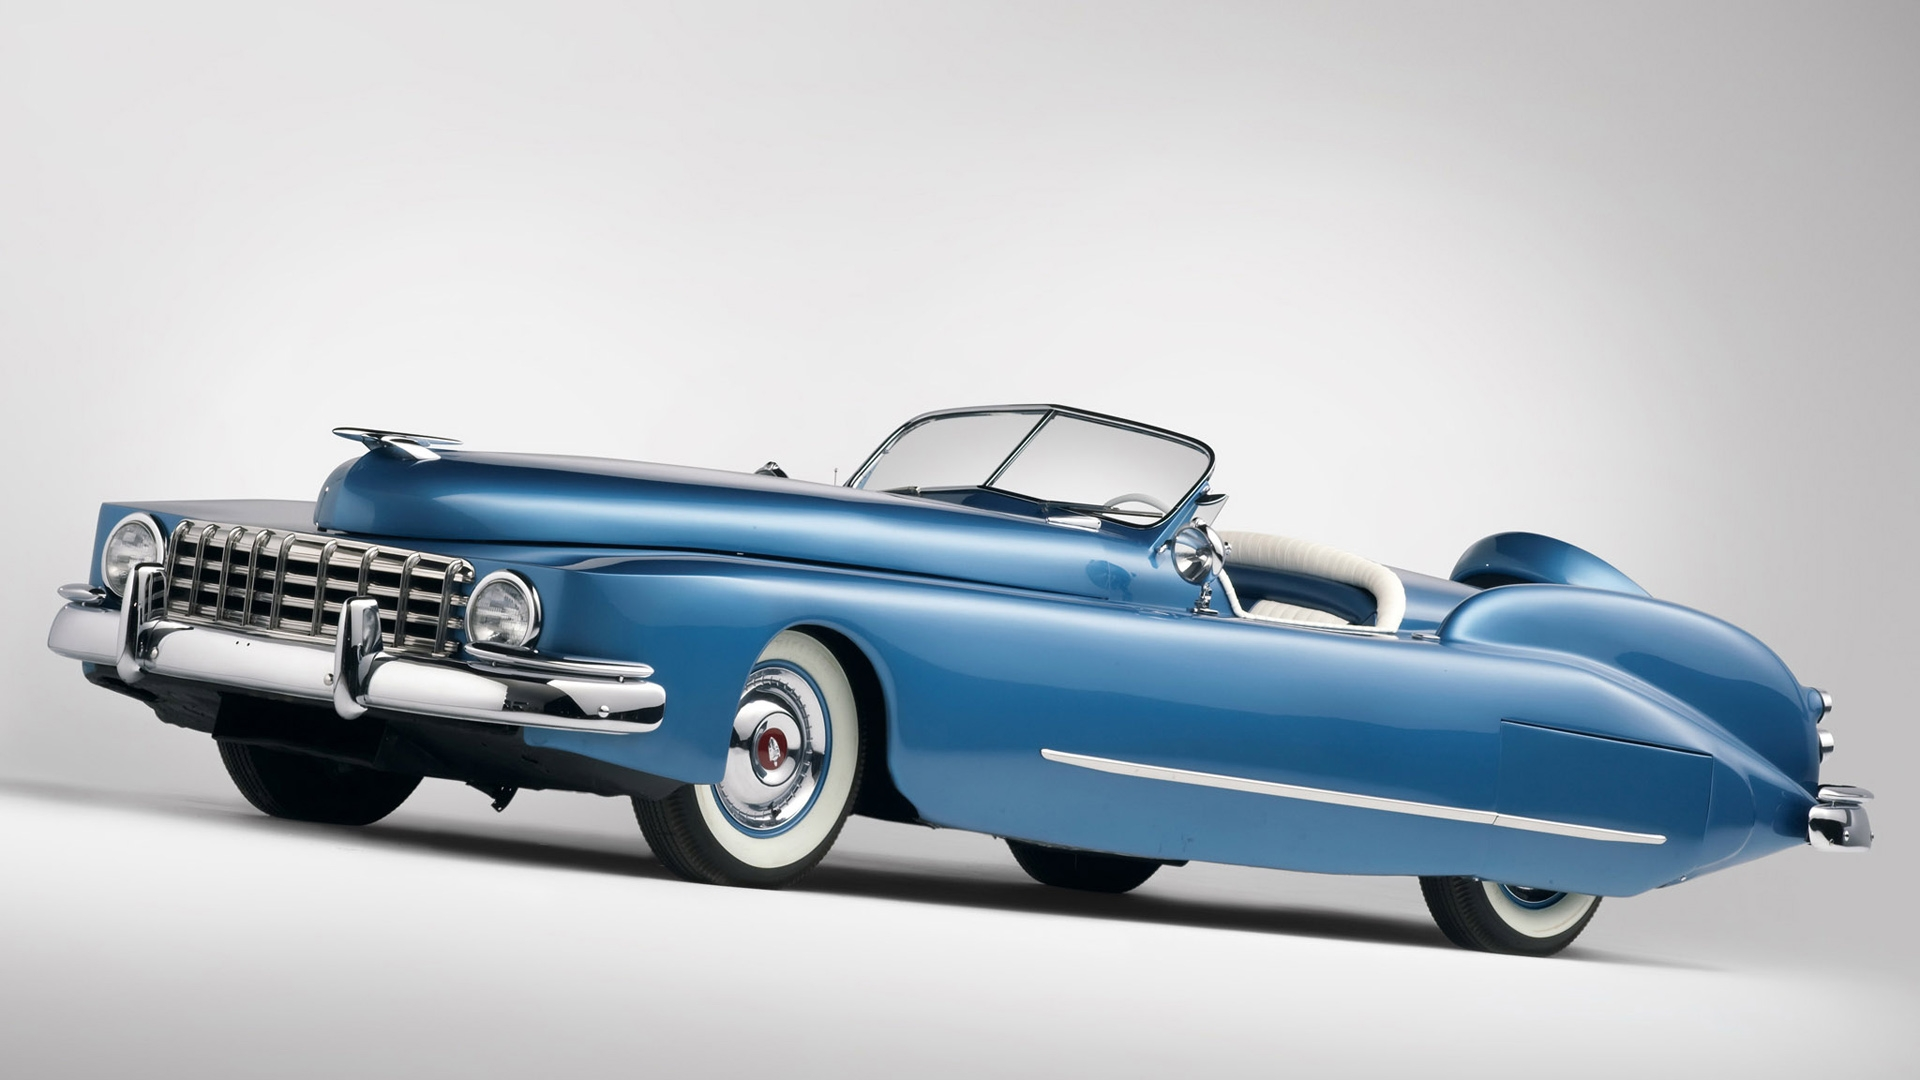 Classic Cars wallpaper   1262120 1920x1080